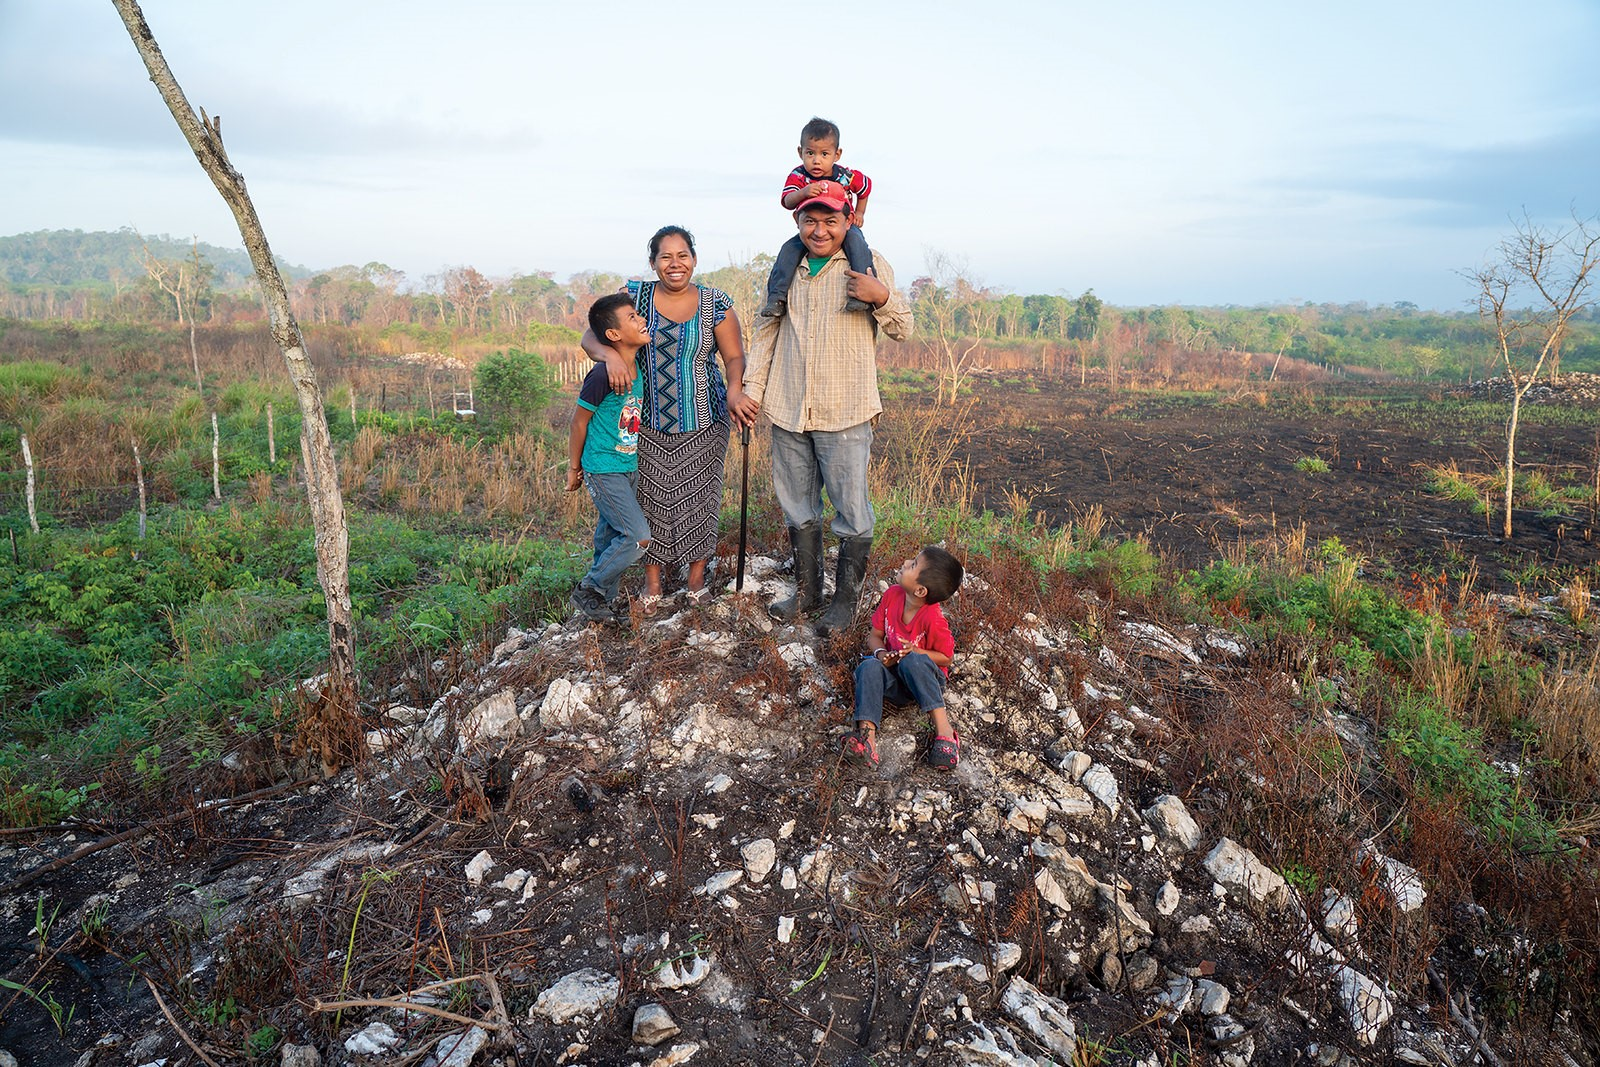 The Rodríguez family, milpa farmers, in Cristóbal Colón, Campeche. (Photo: CIMMYT/Peter Lowe)